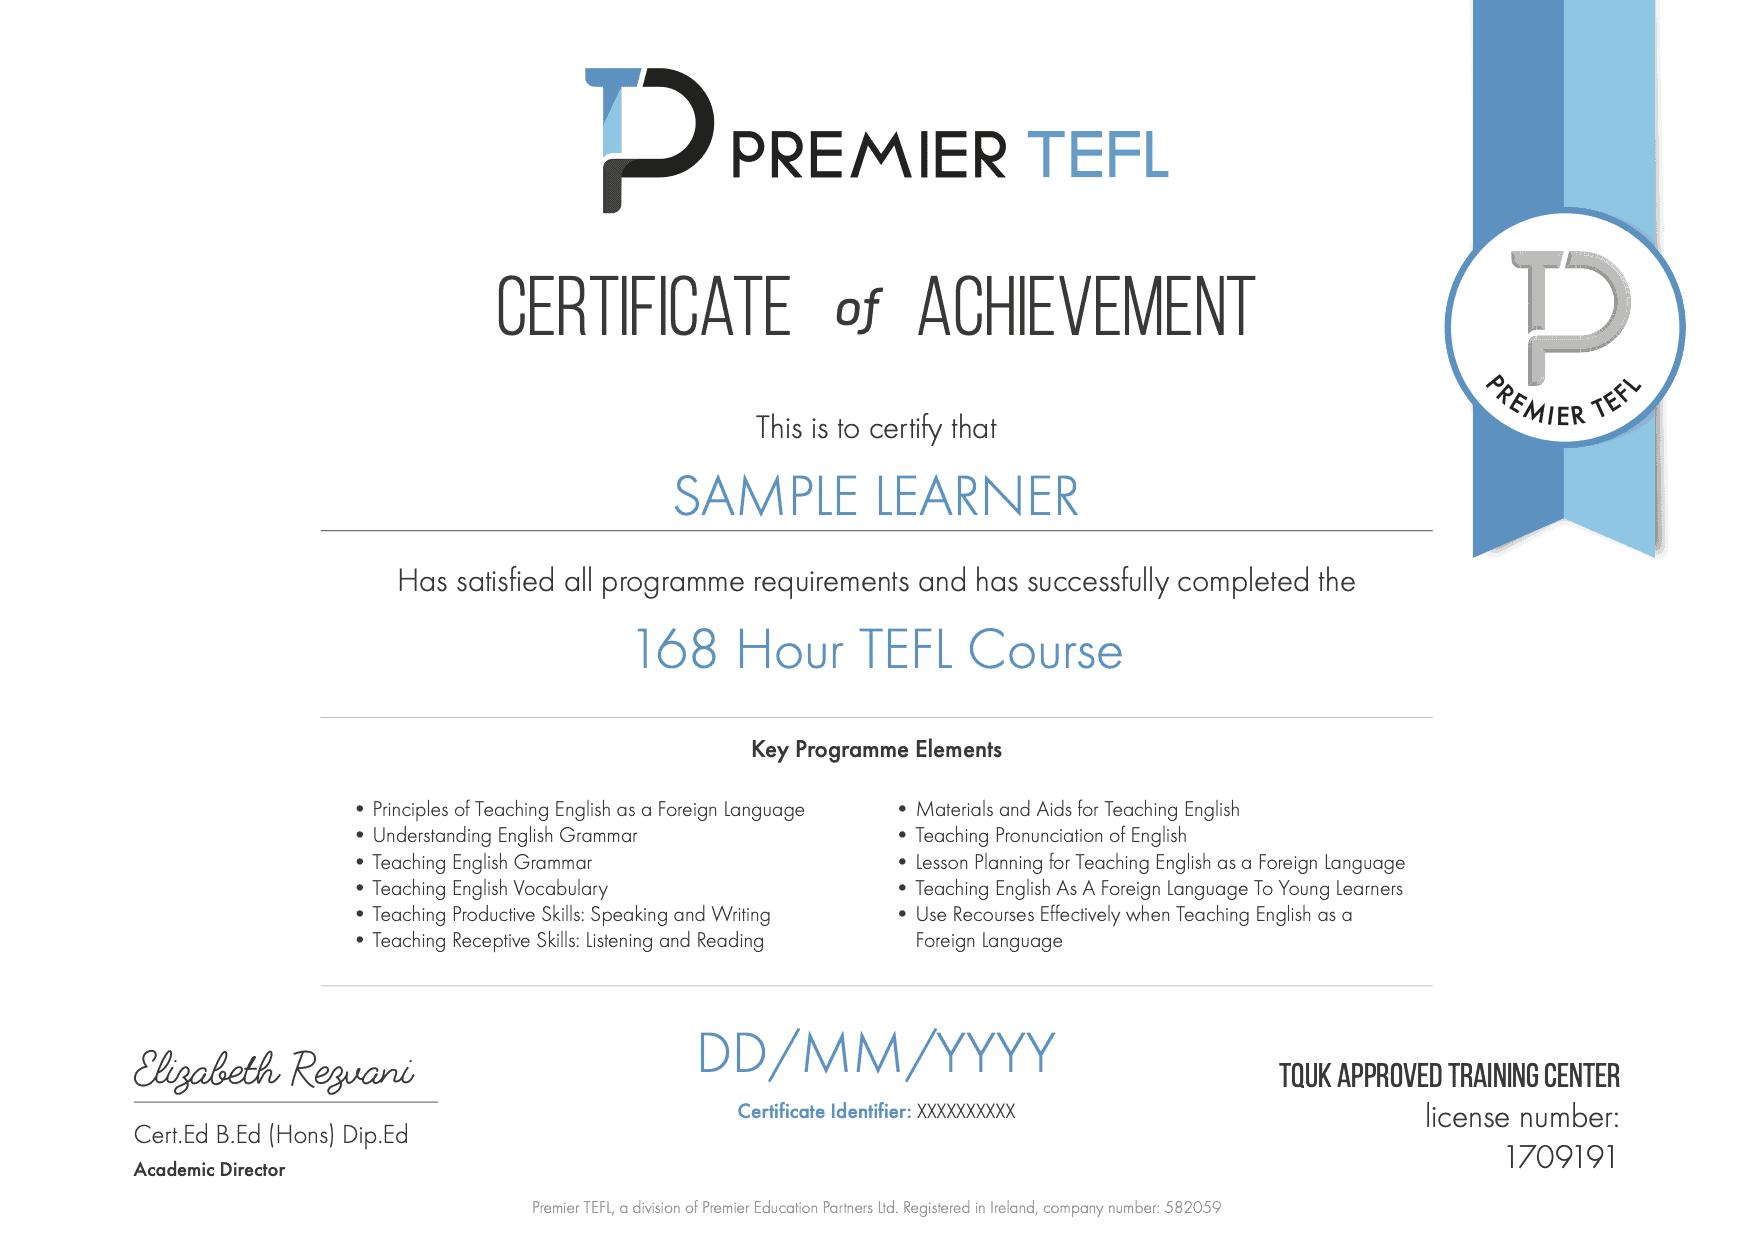 tefl premier certificate sample course hour level certification receive verifiable graduates earn